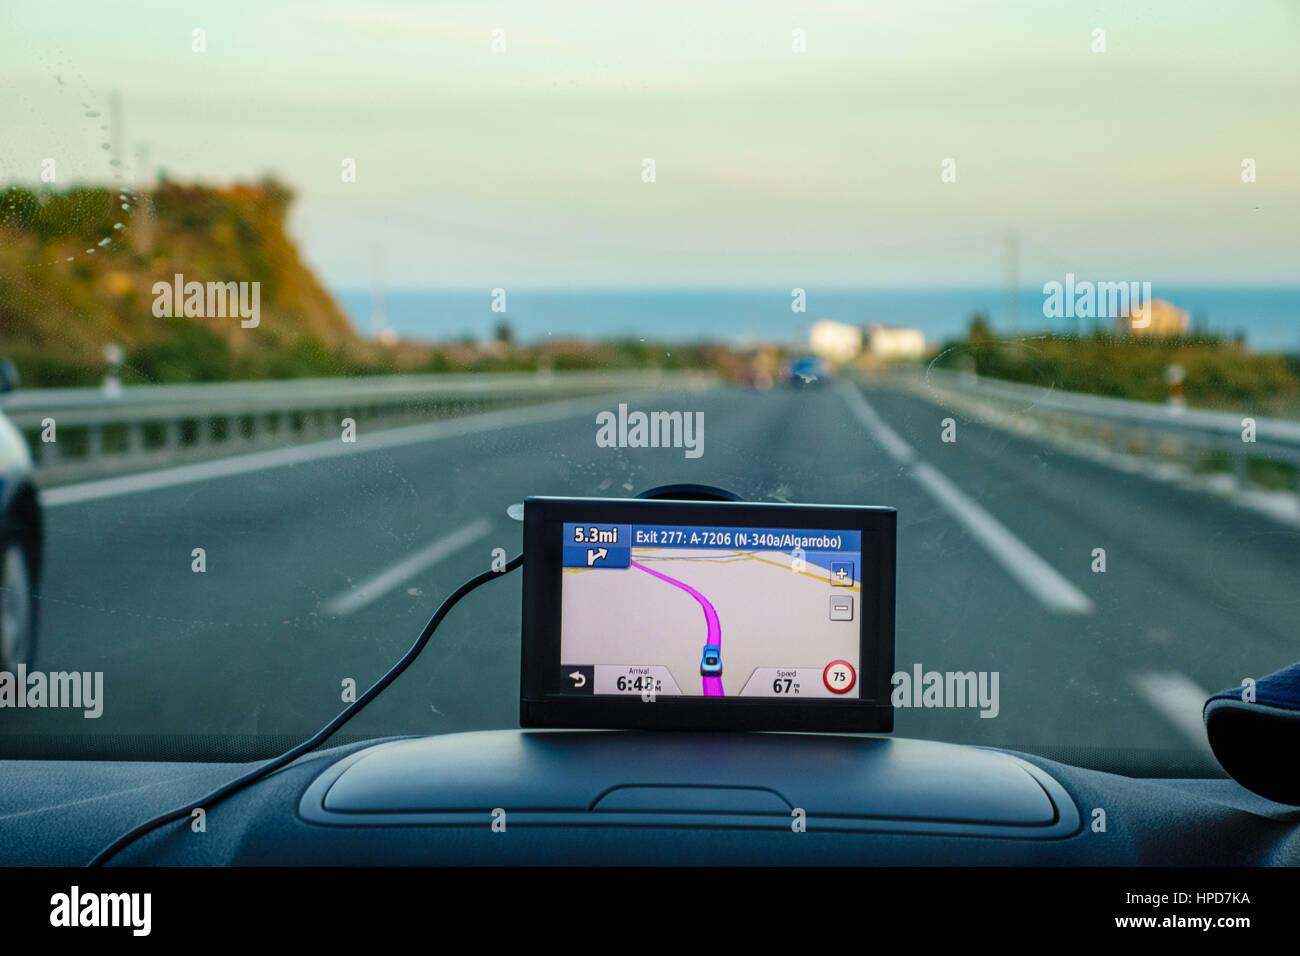 Satnav, Sat nav, or gps satellite navigation in car. UK car with satnav on dashboard Costa del Sol Spain. Looking Stock Photo